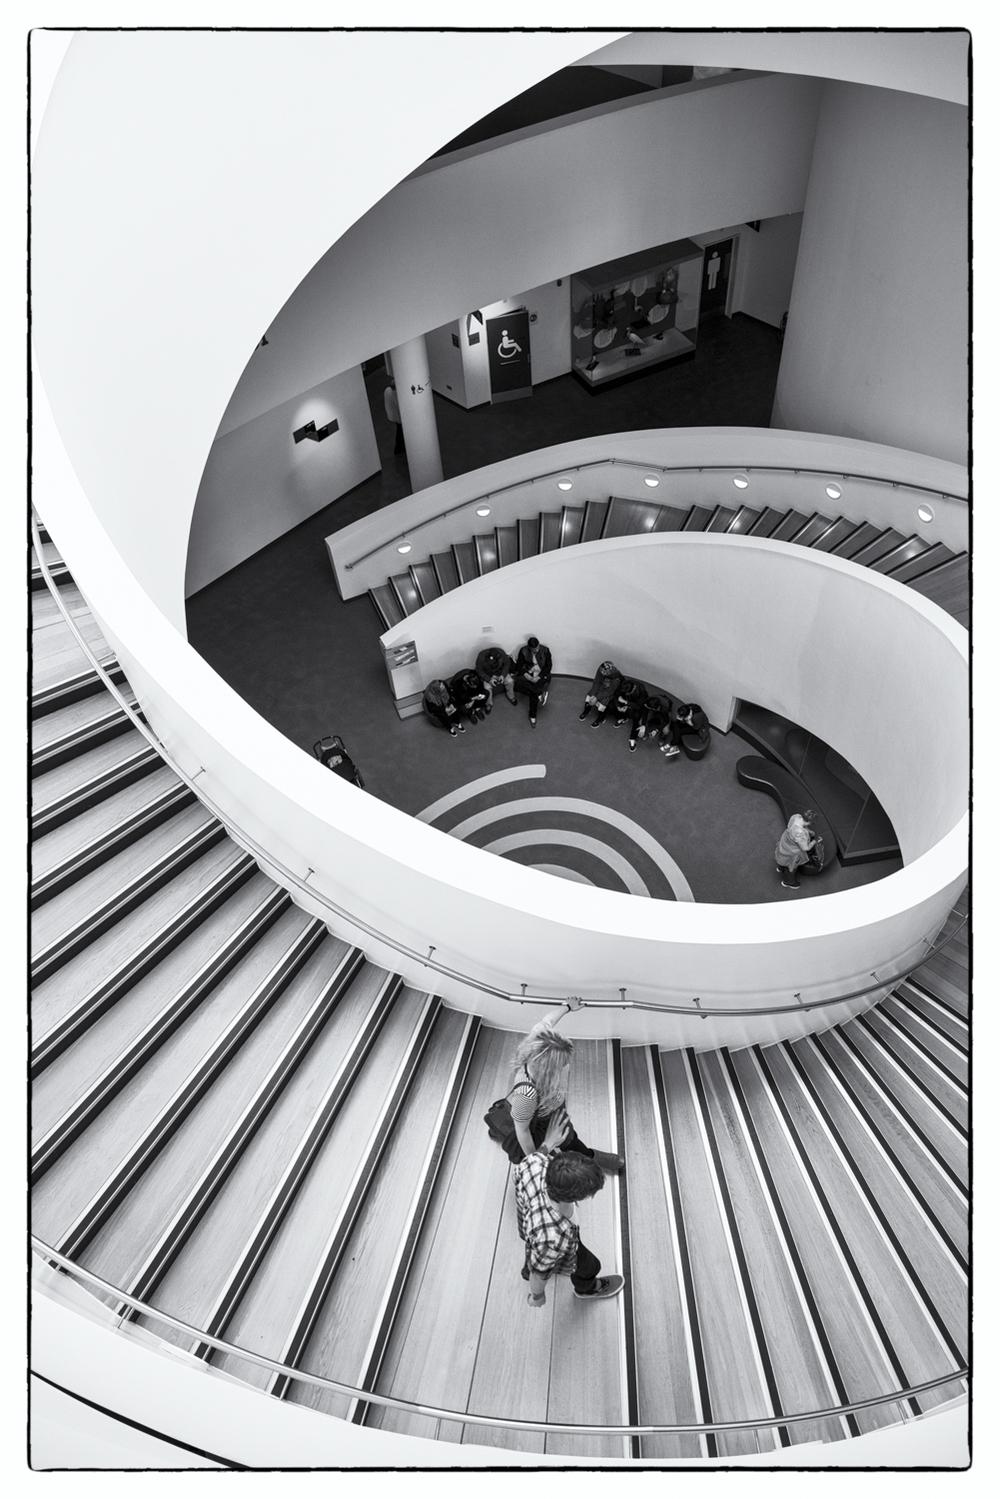 MuseumofLiverpoolSmall--4.jpg